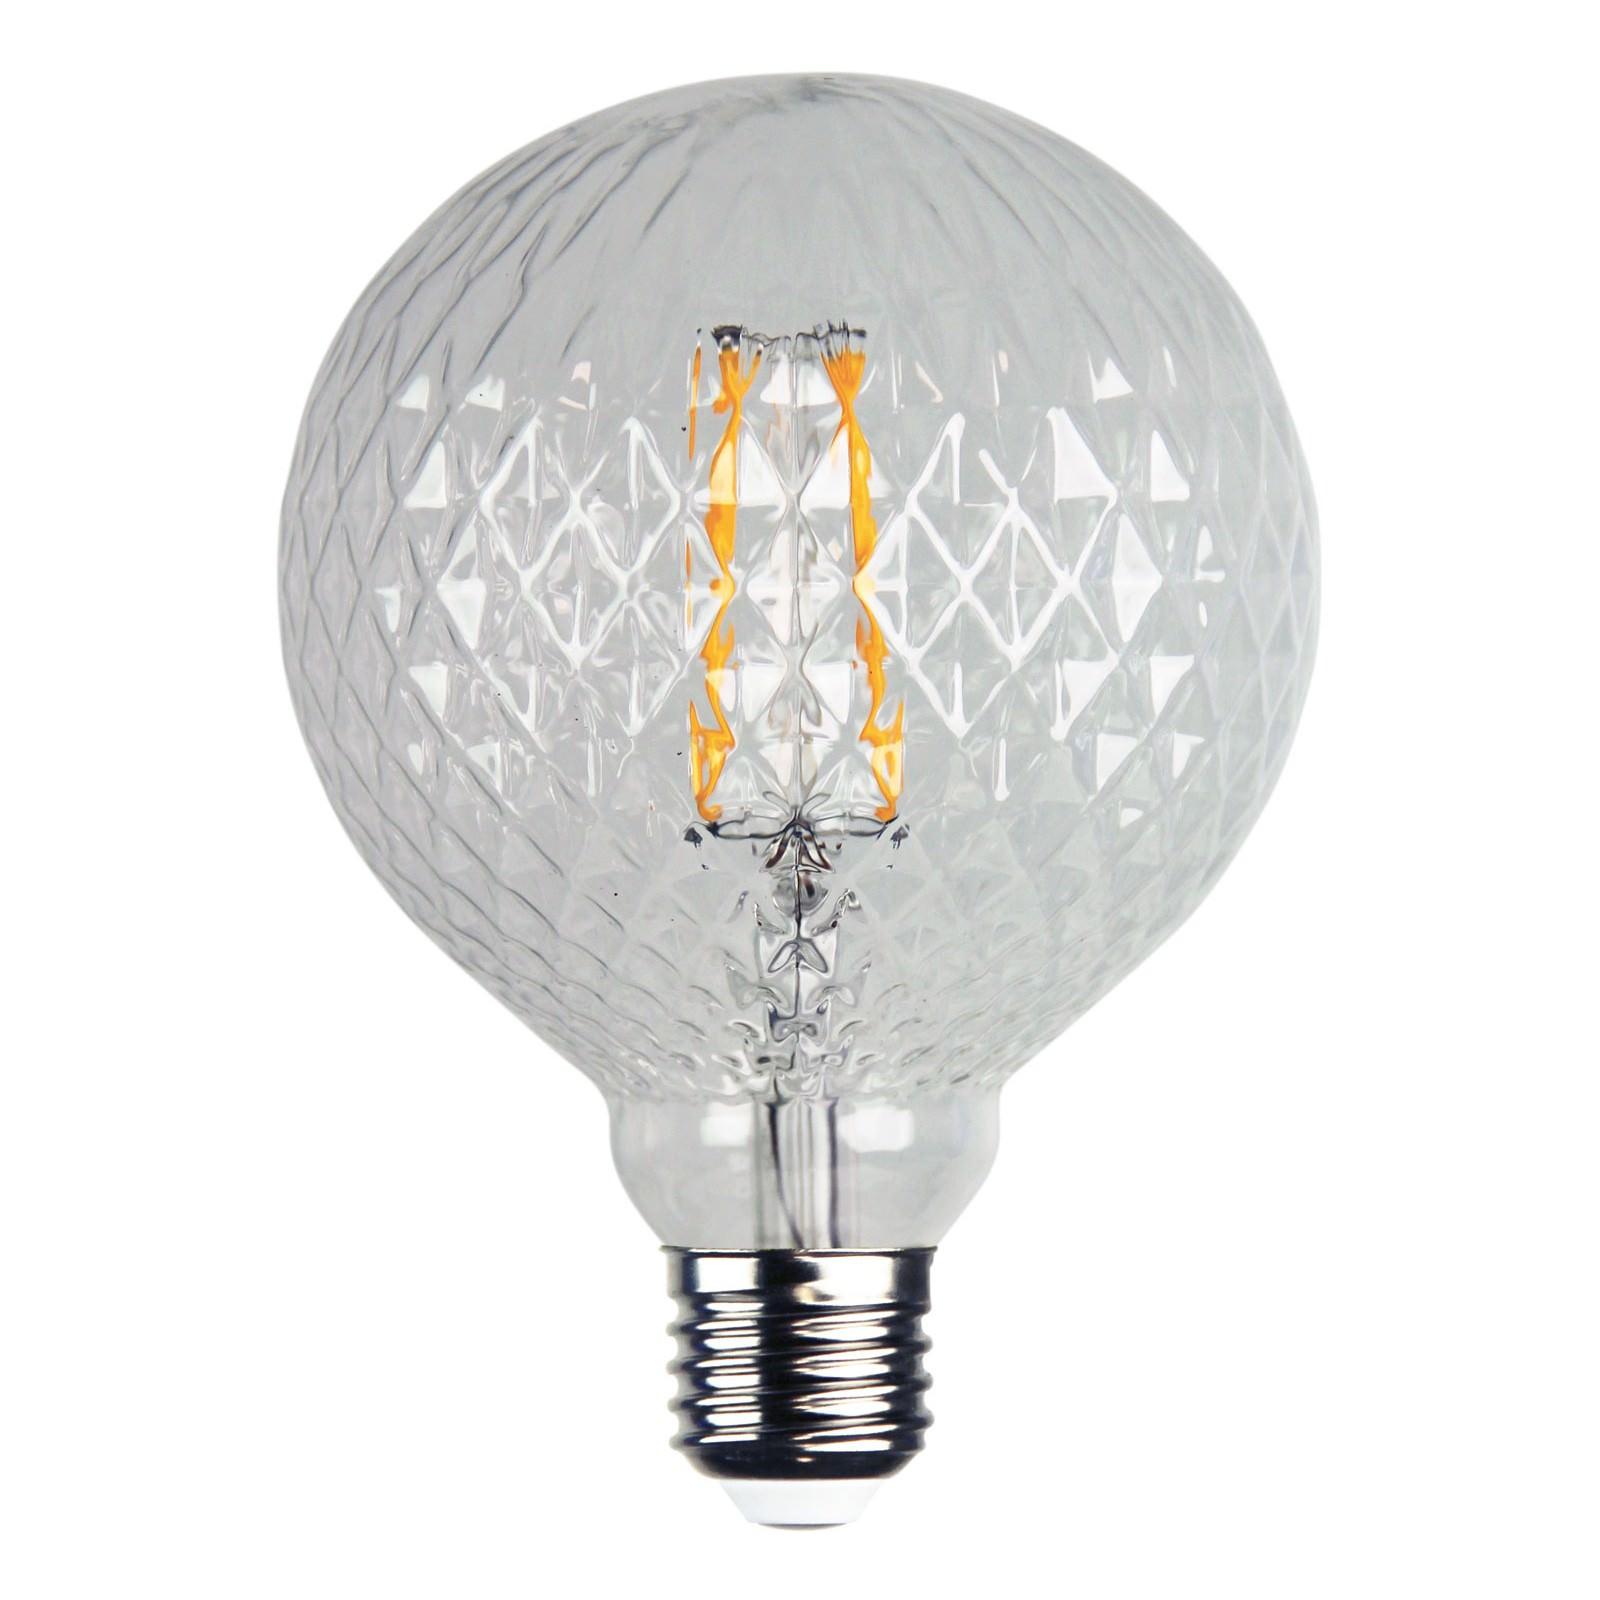 Allume Crystal LED Filament Globe, E27, 2200K, G125 Shape